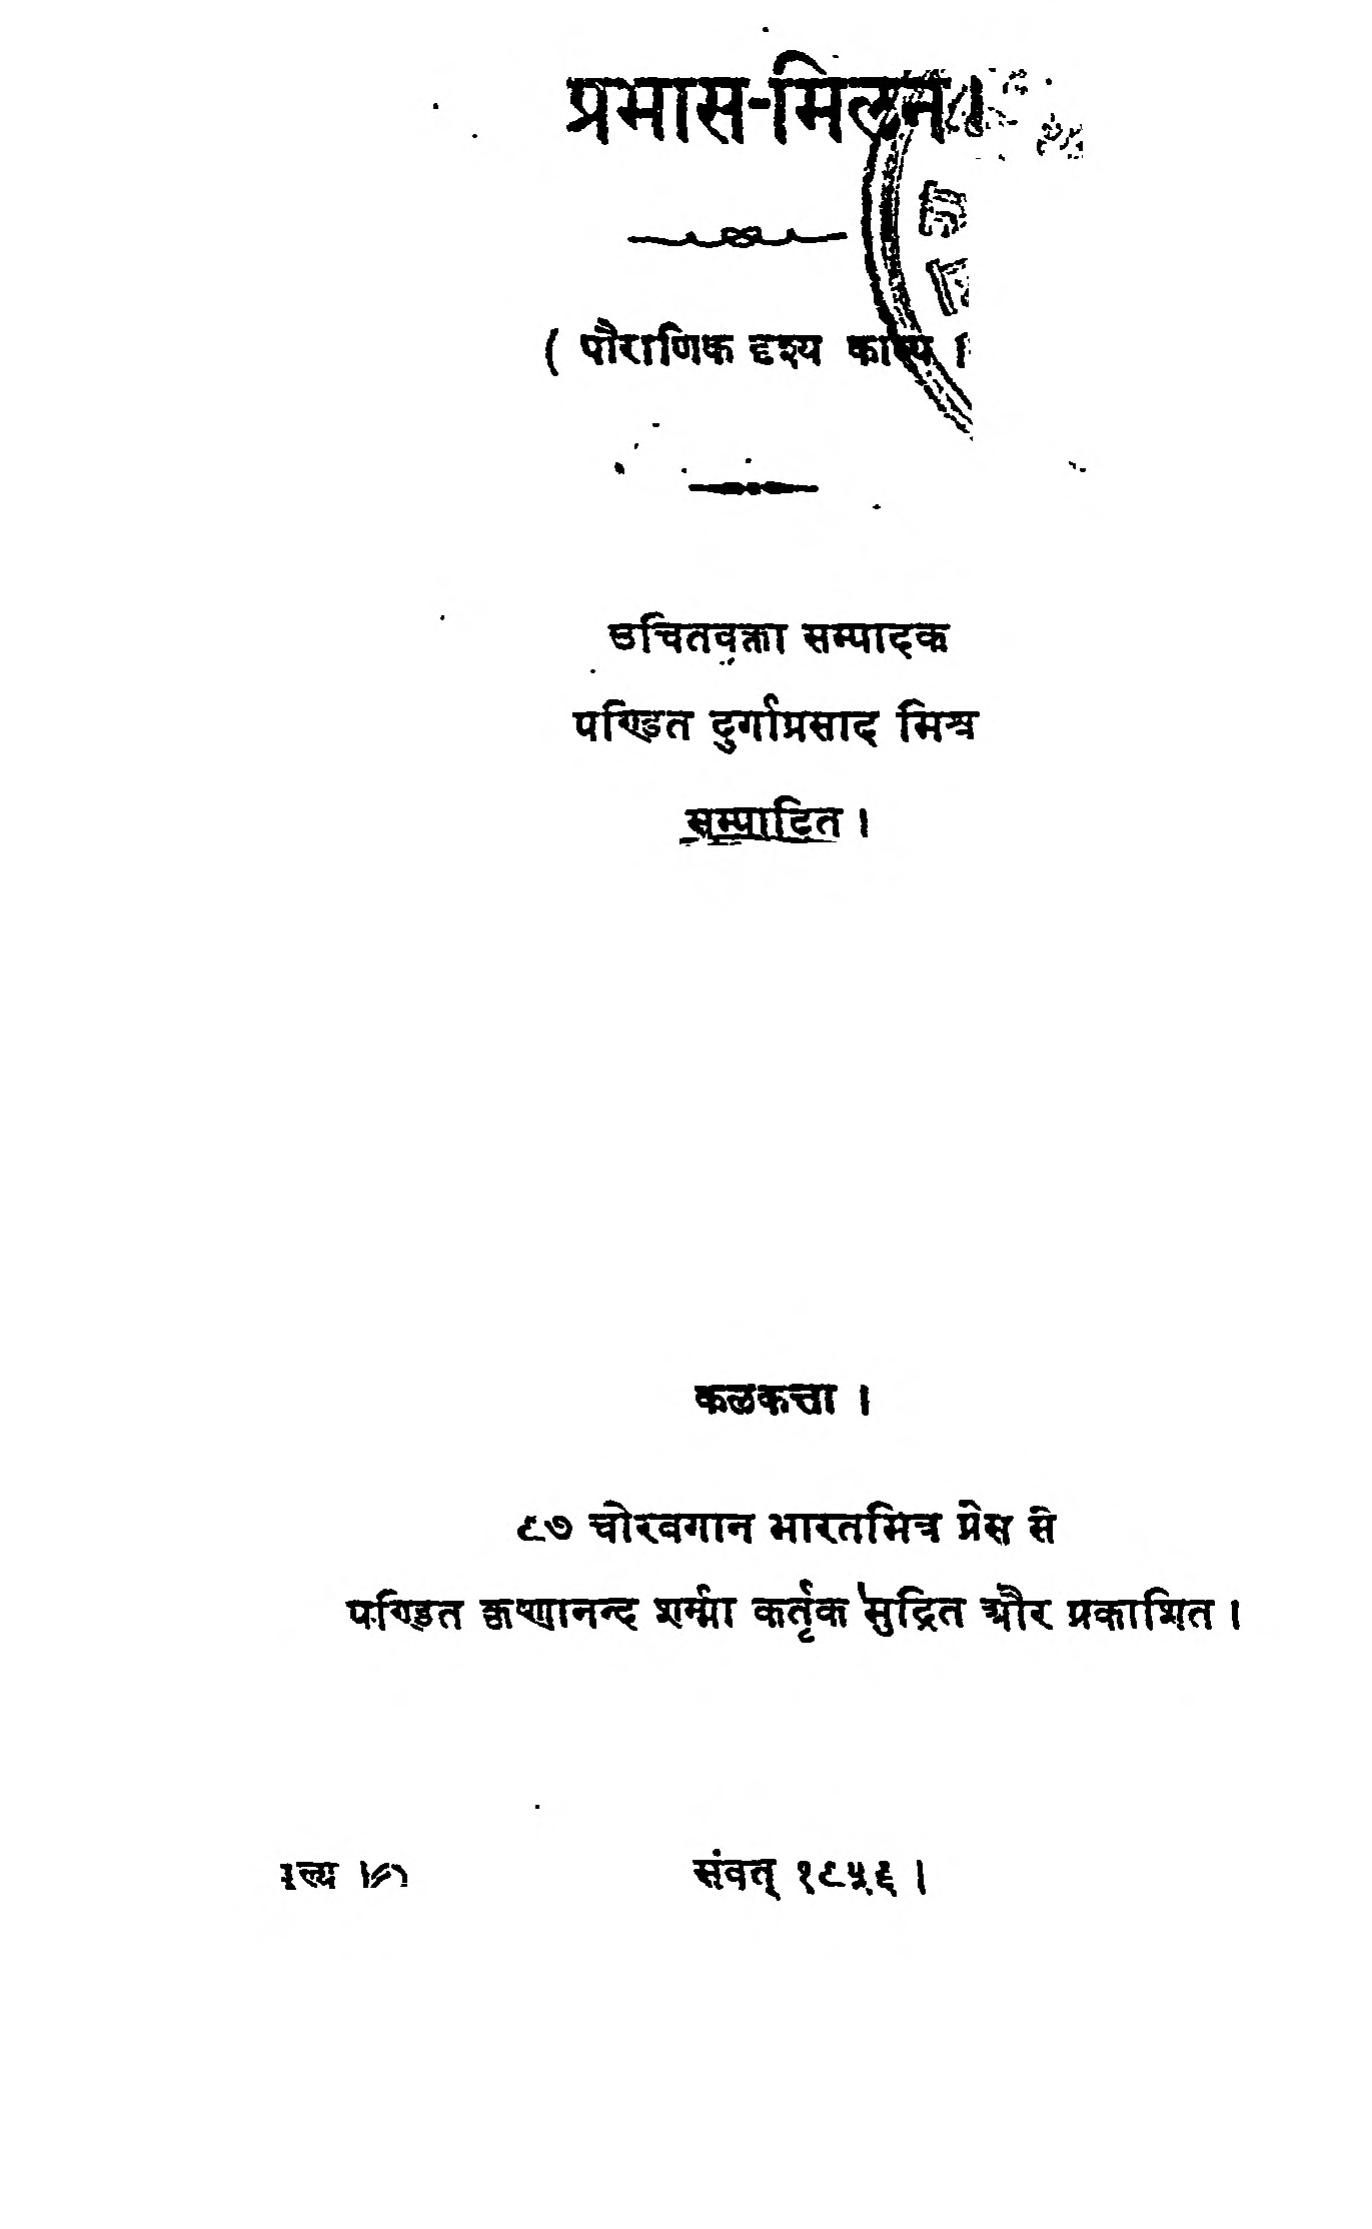 पभास मिलन  by पण्डित दुर्गाप्रसाद मिश्र - Pandit Durgaprasad Mishr